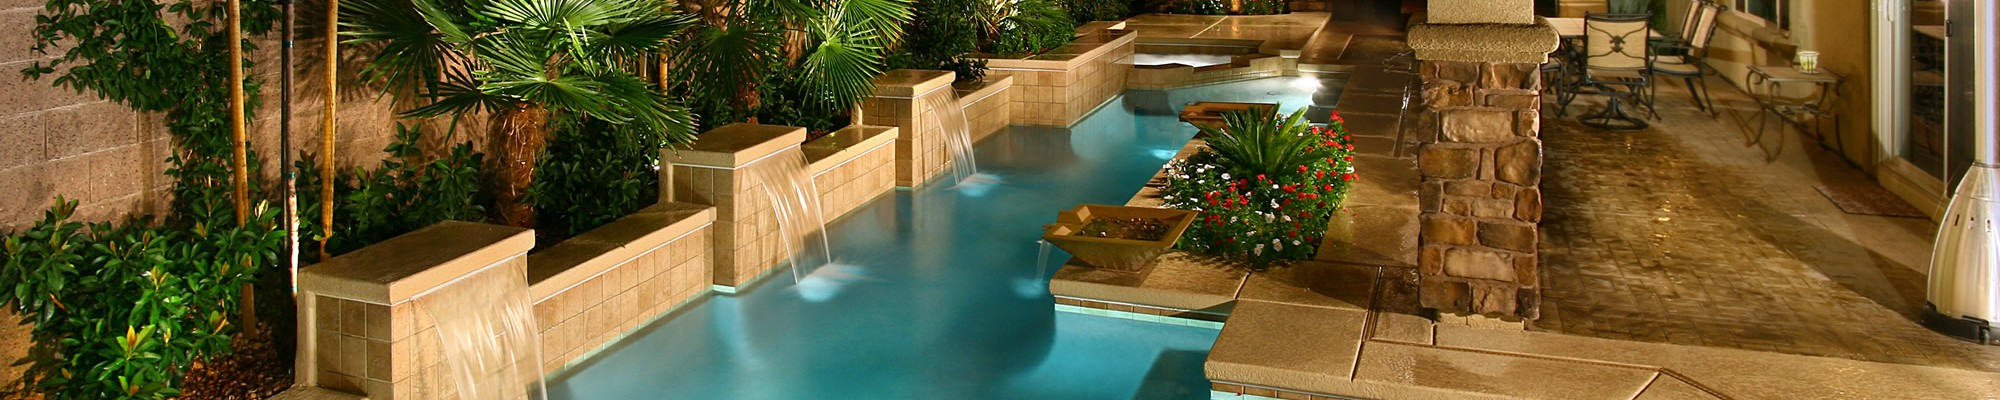 Landscaping & Backyard Design Services